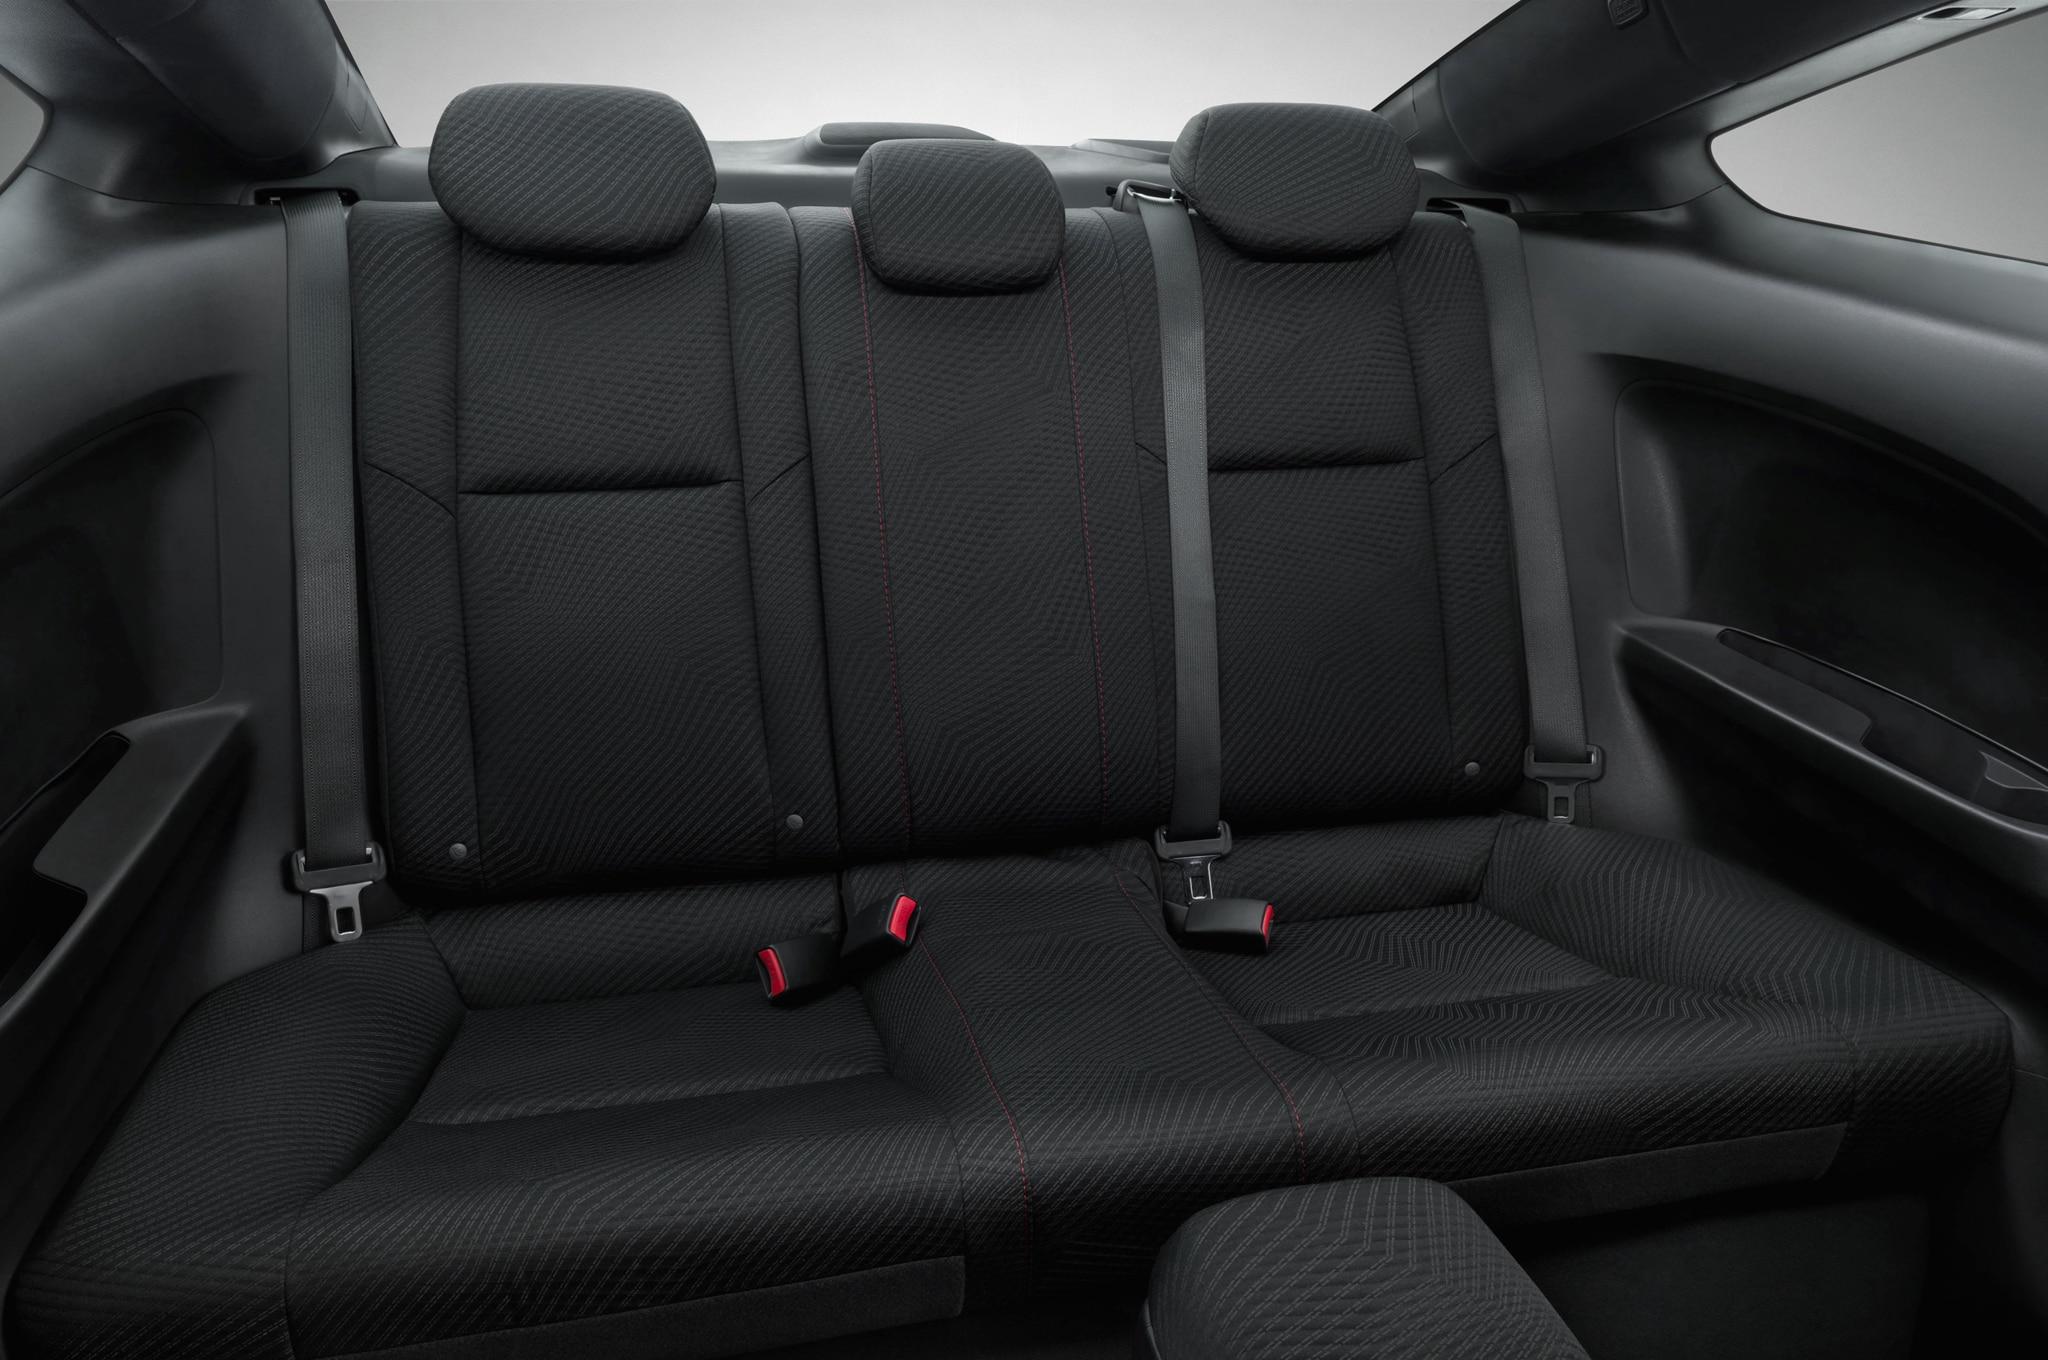 2013 Honda Civic Si Sedan Interior